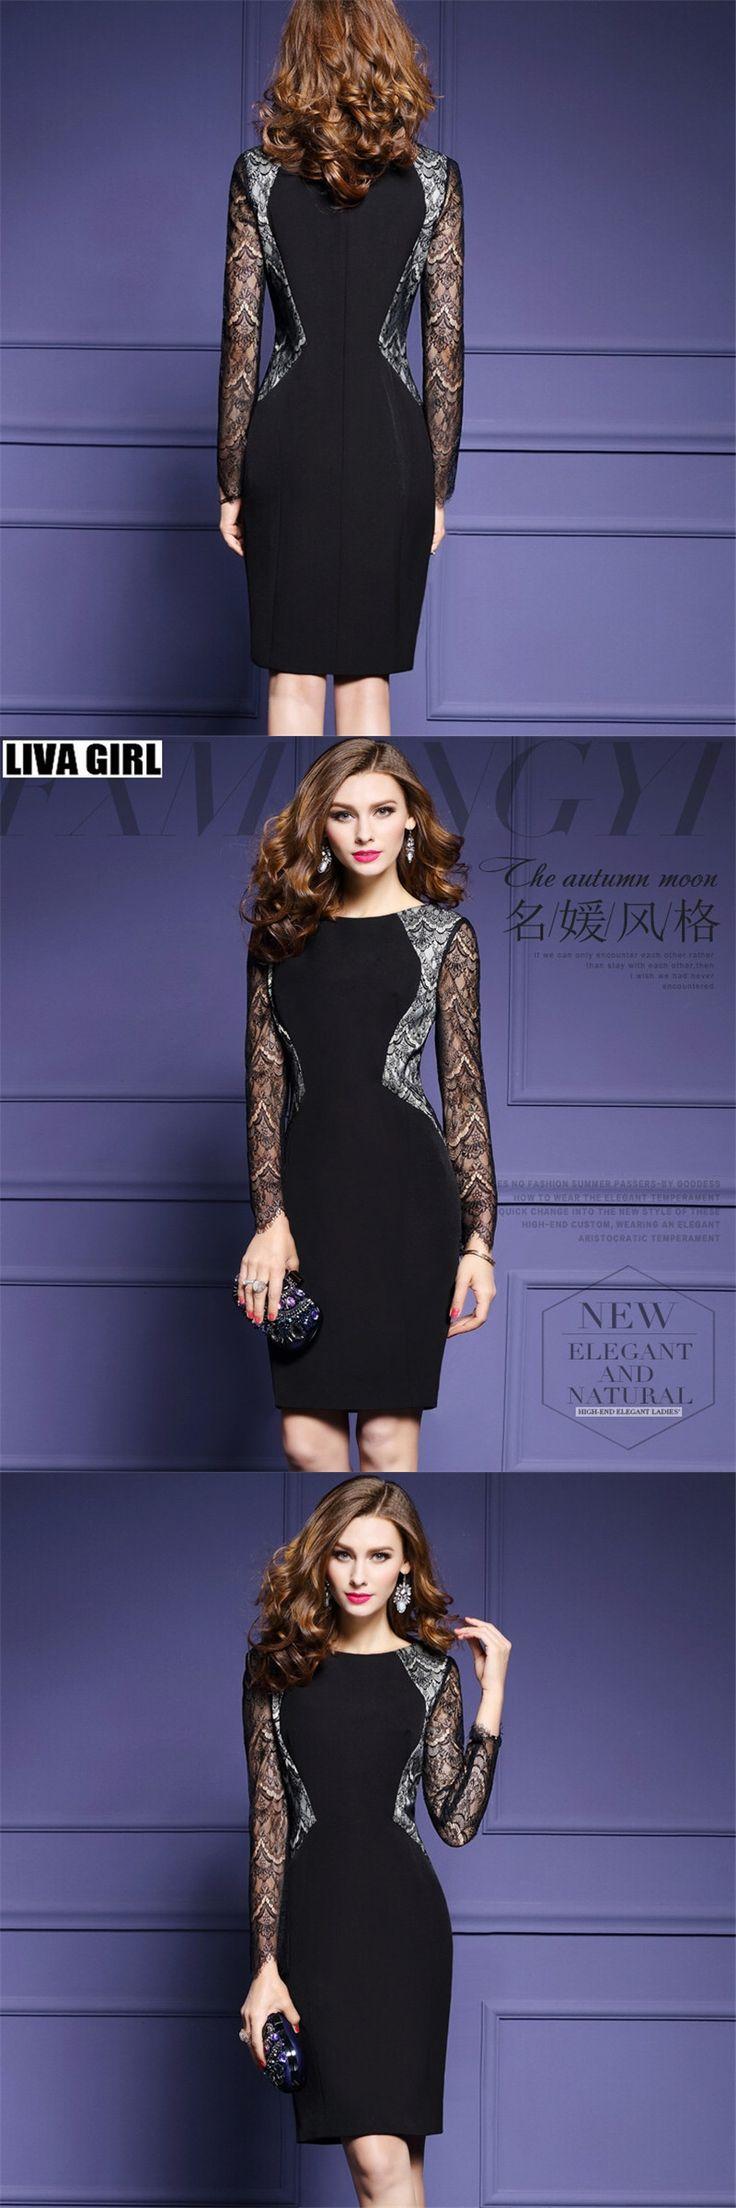 Mejores 167 imágenes de Dresses en Pinterest | Backless, Vestido de ...